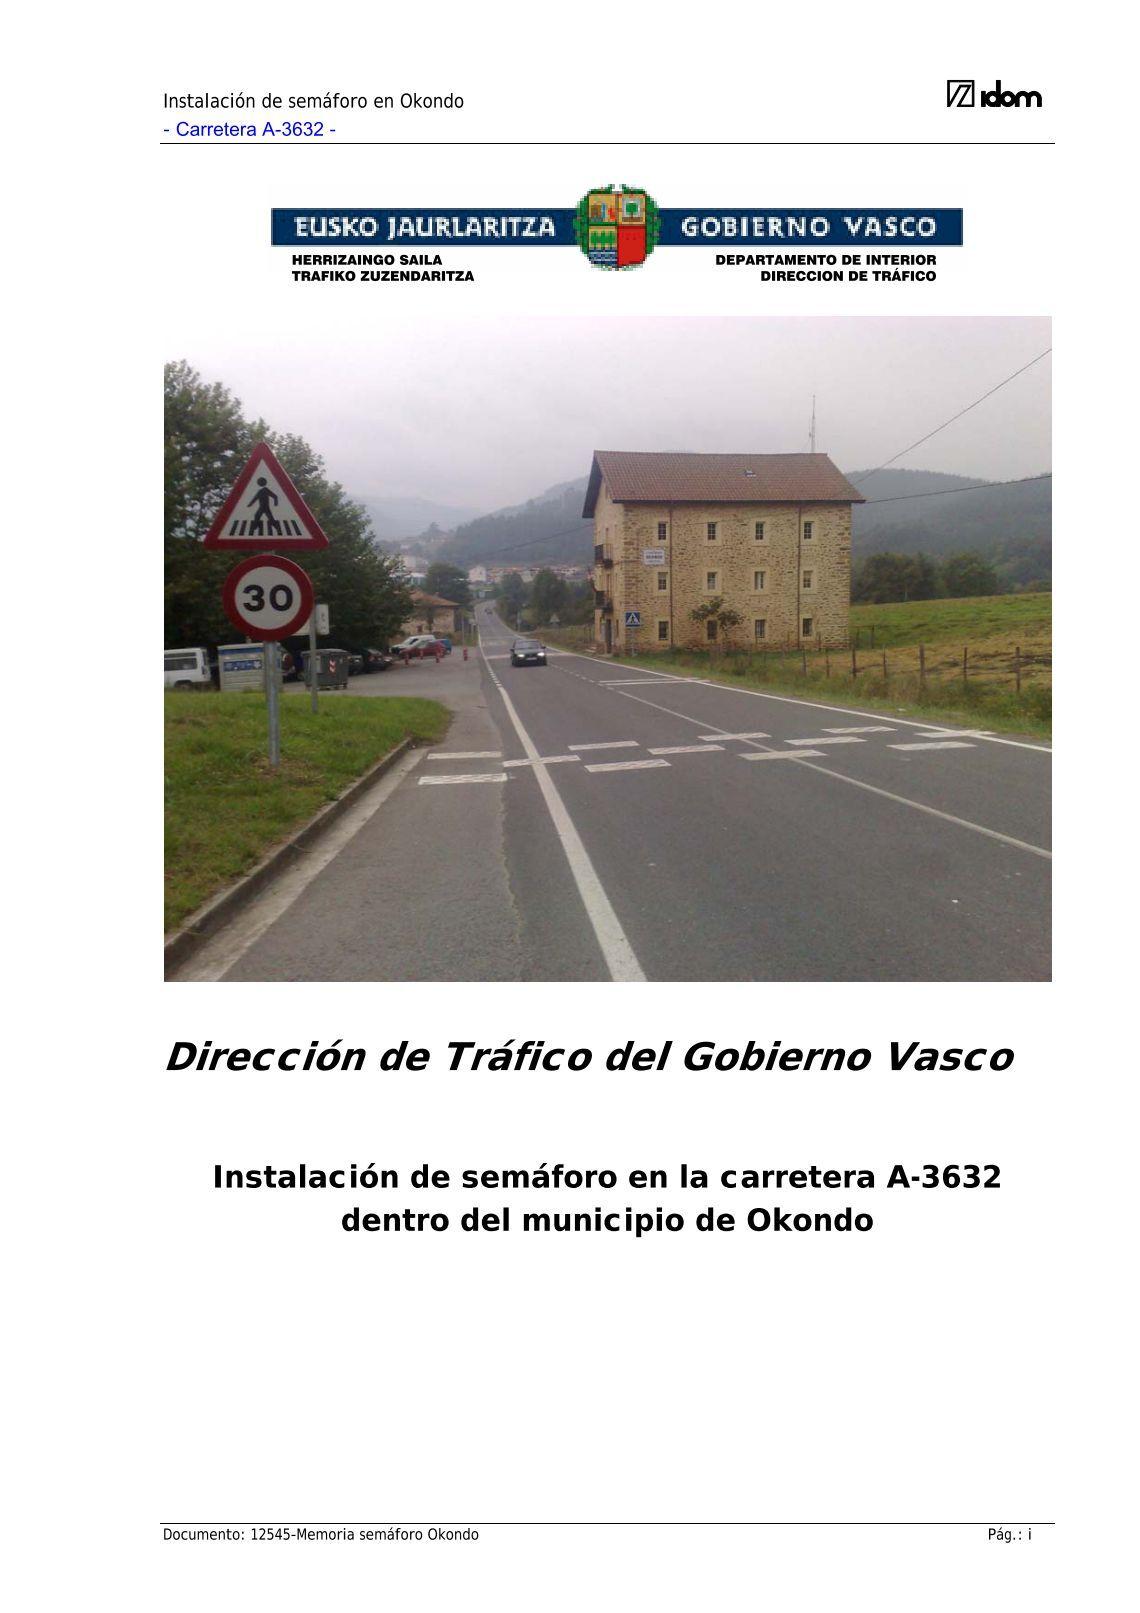 100 free magazines from interior ejgv euskadi net - Departamento de interior del gobierno vasco ...